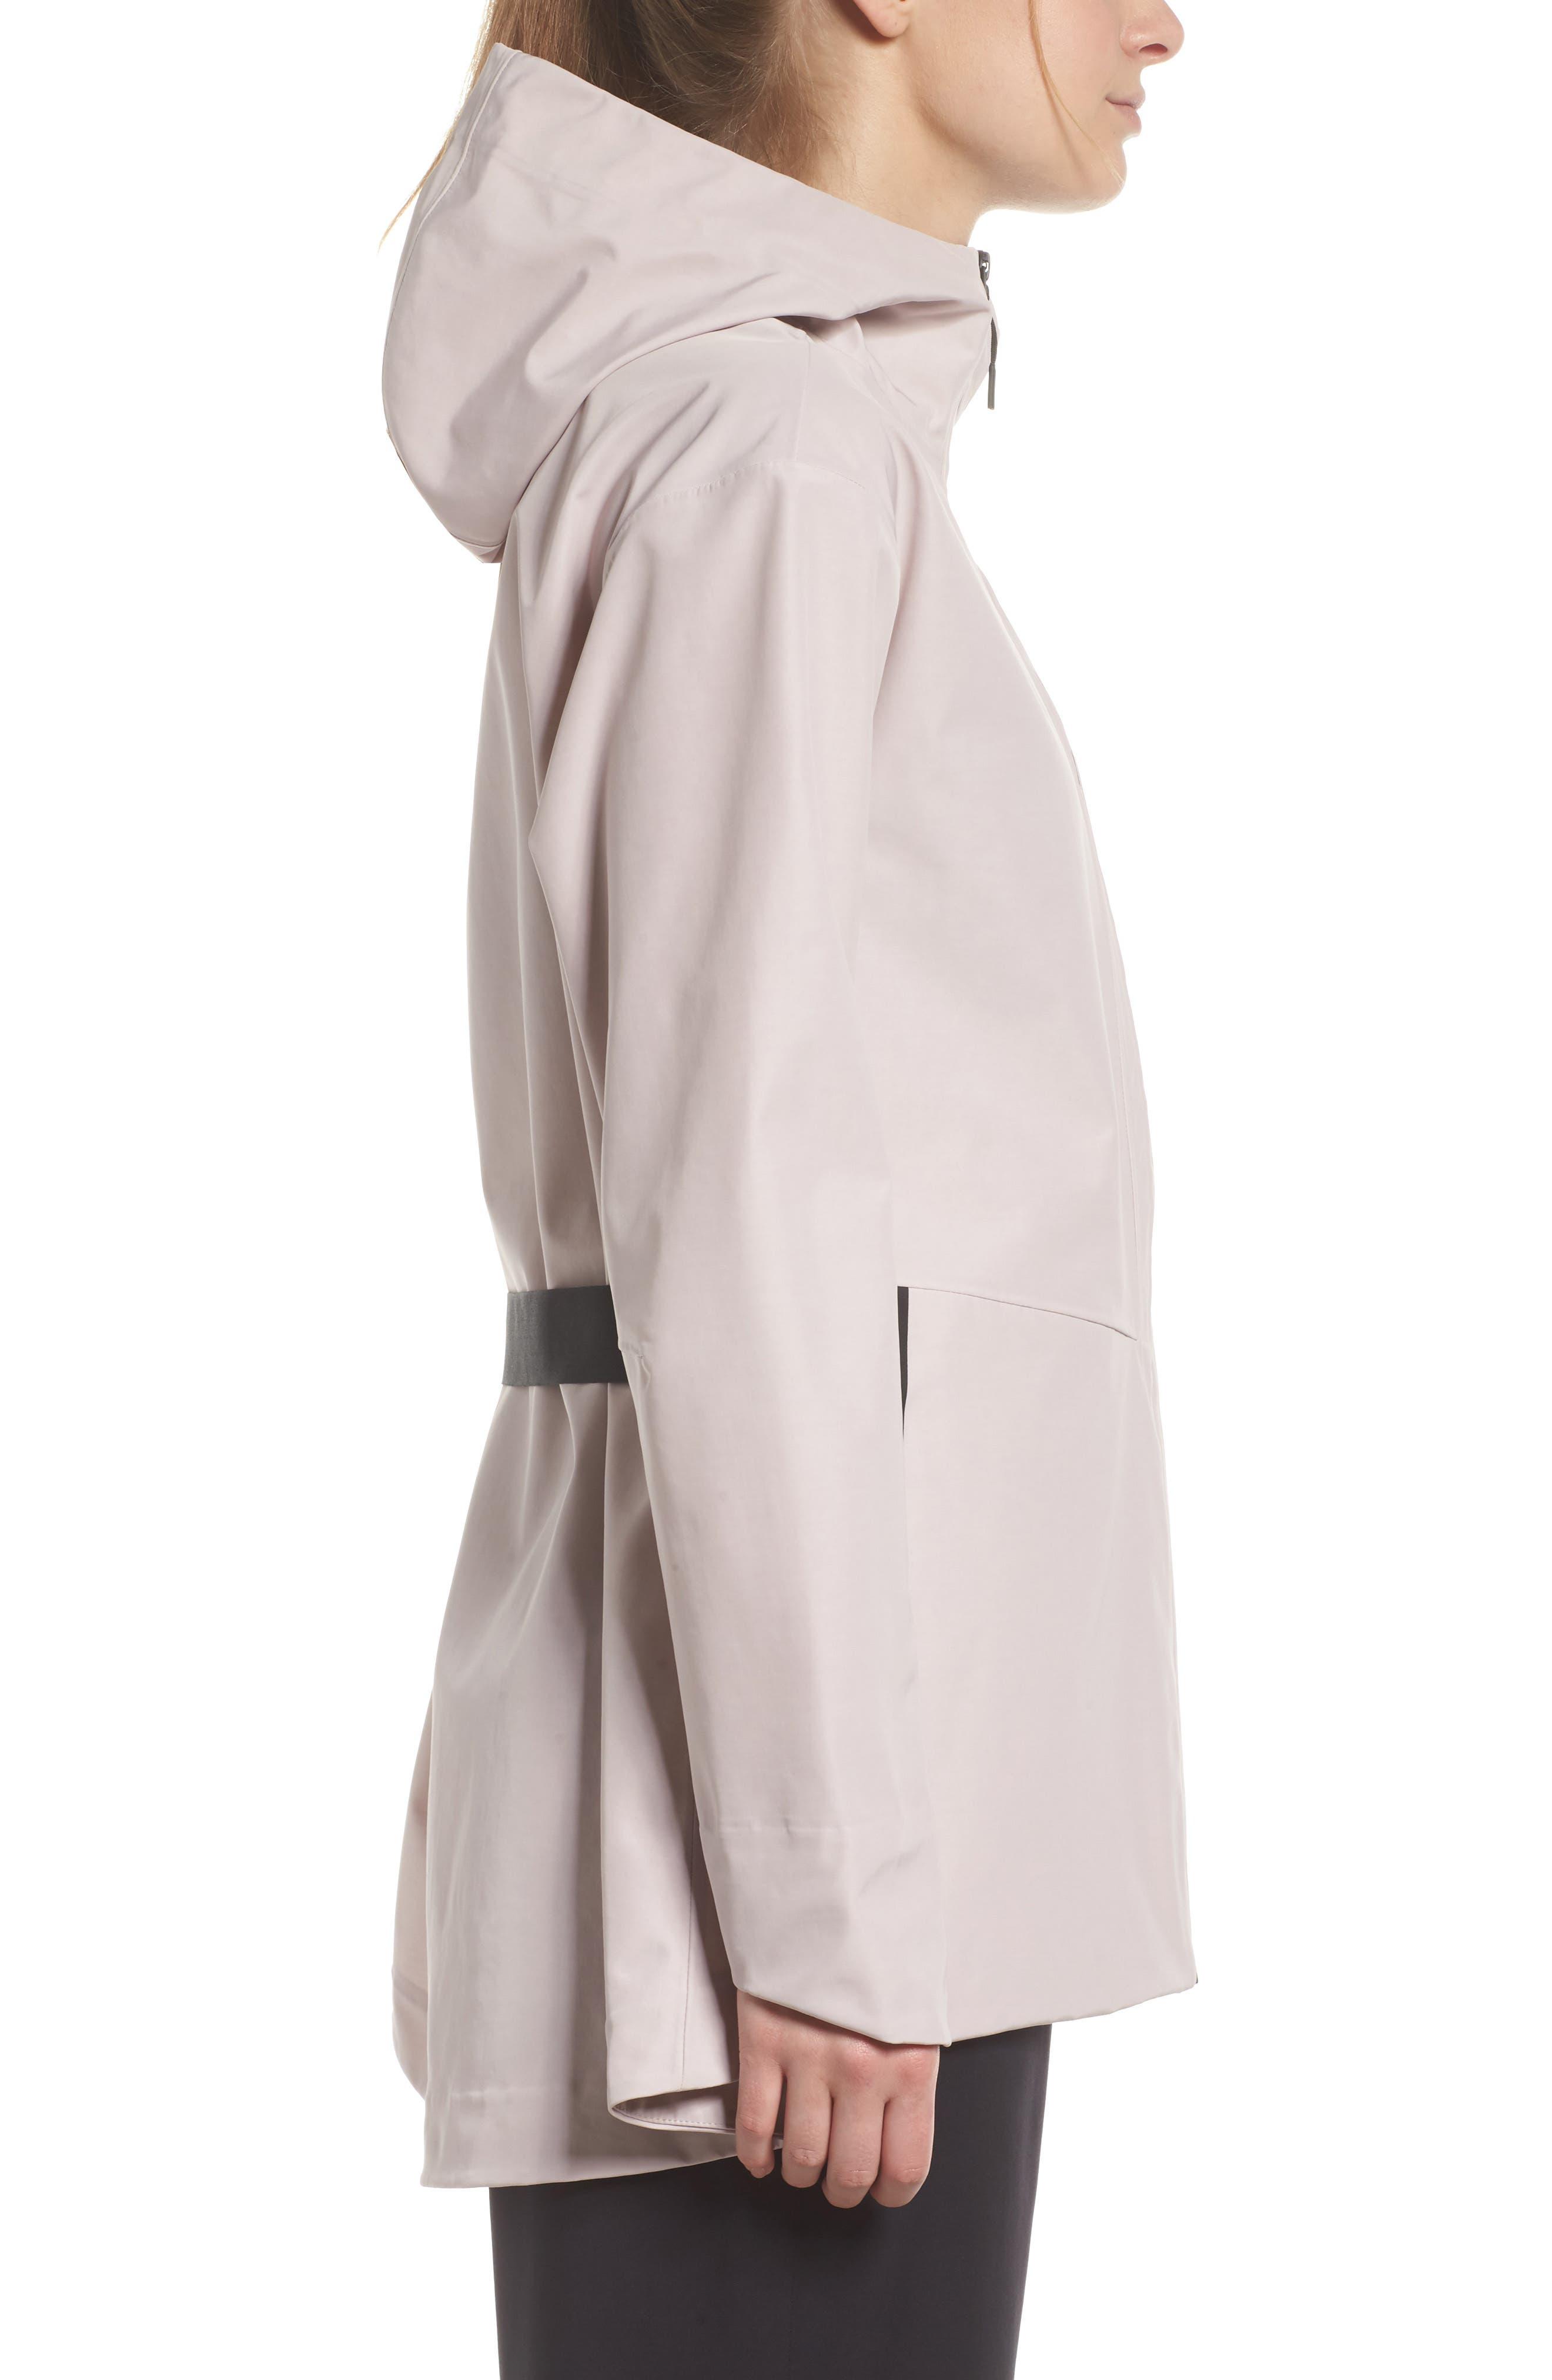 Sportswear Women's Tech Jacket,                             Alternate thumbnail 3, color,                             Particle Rose/ Black